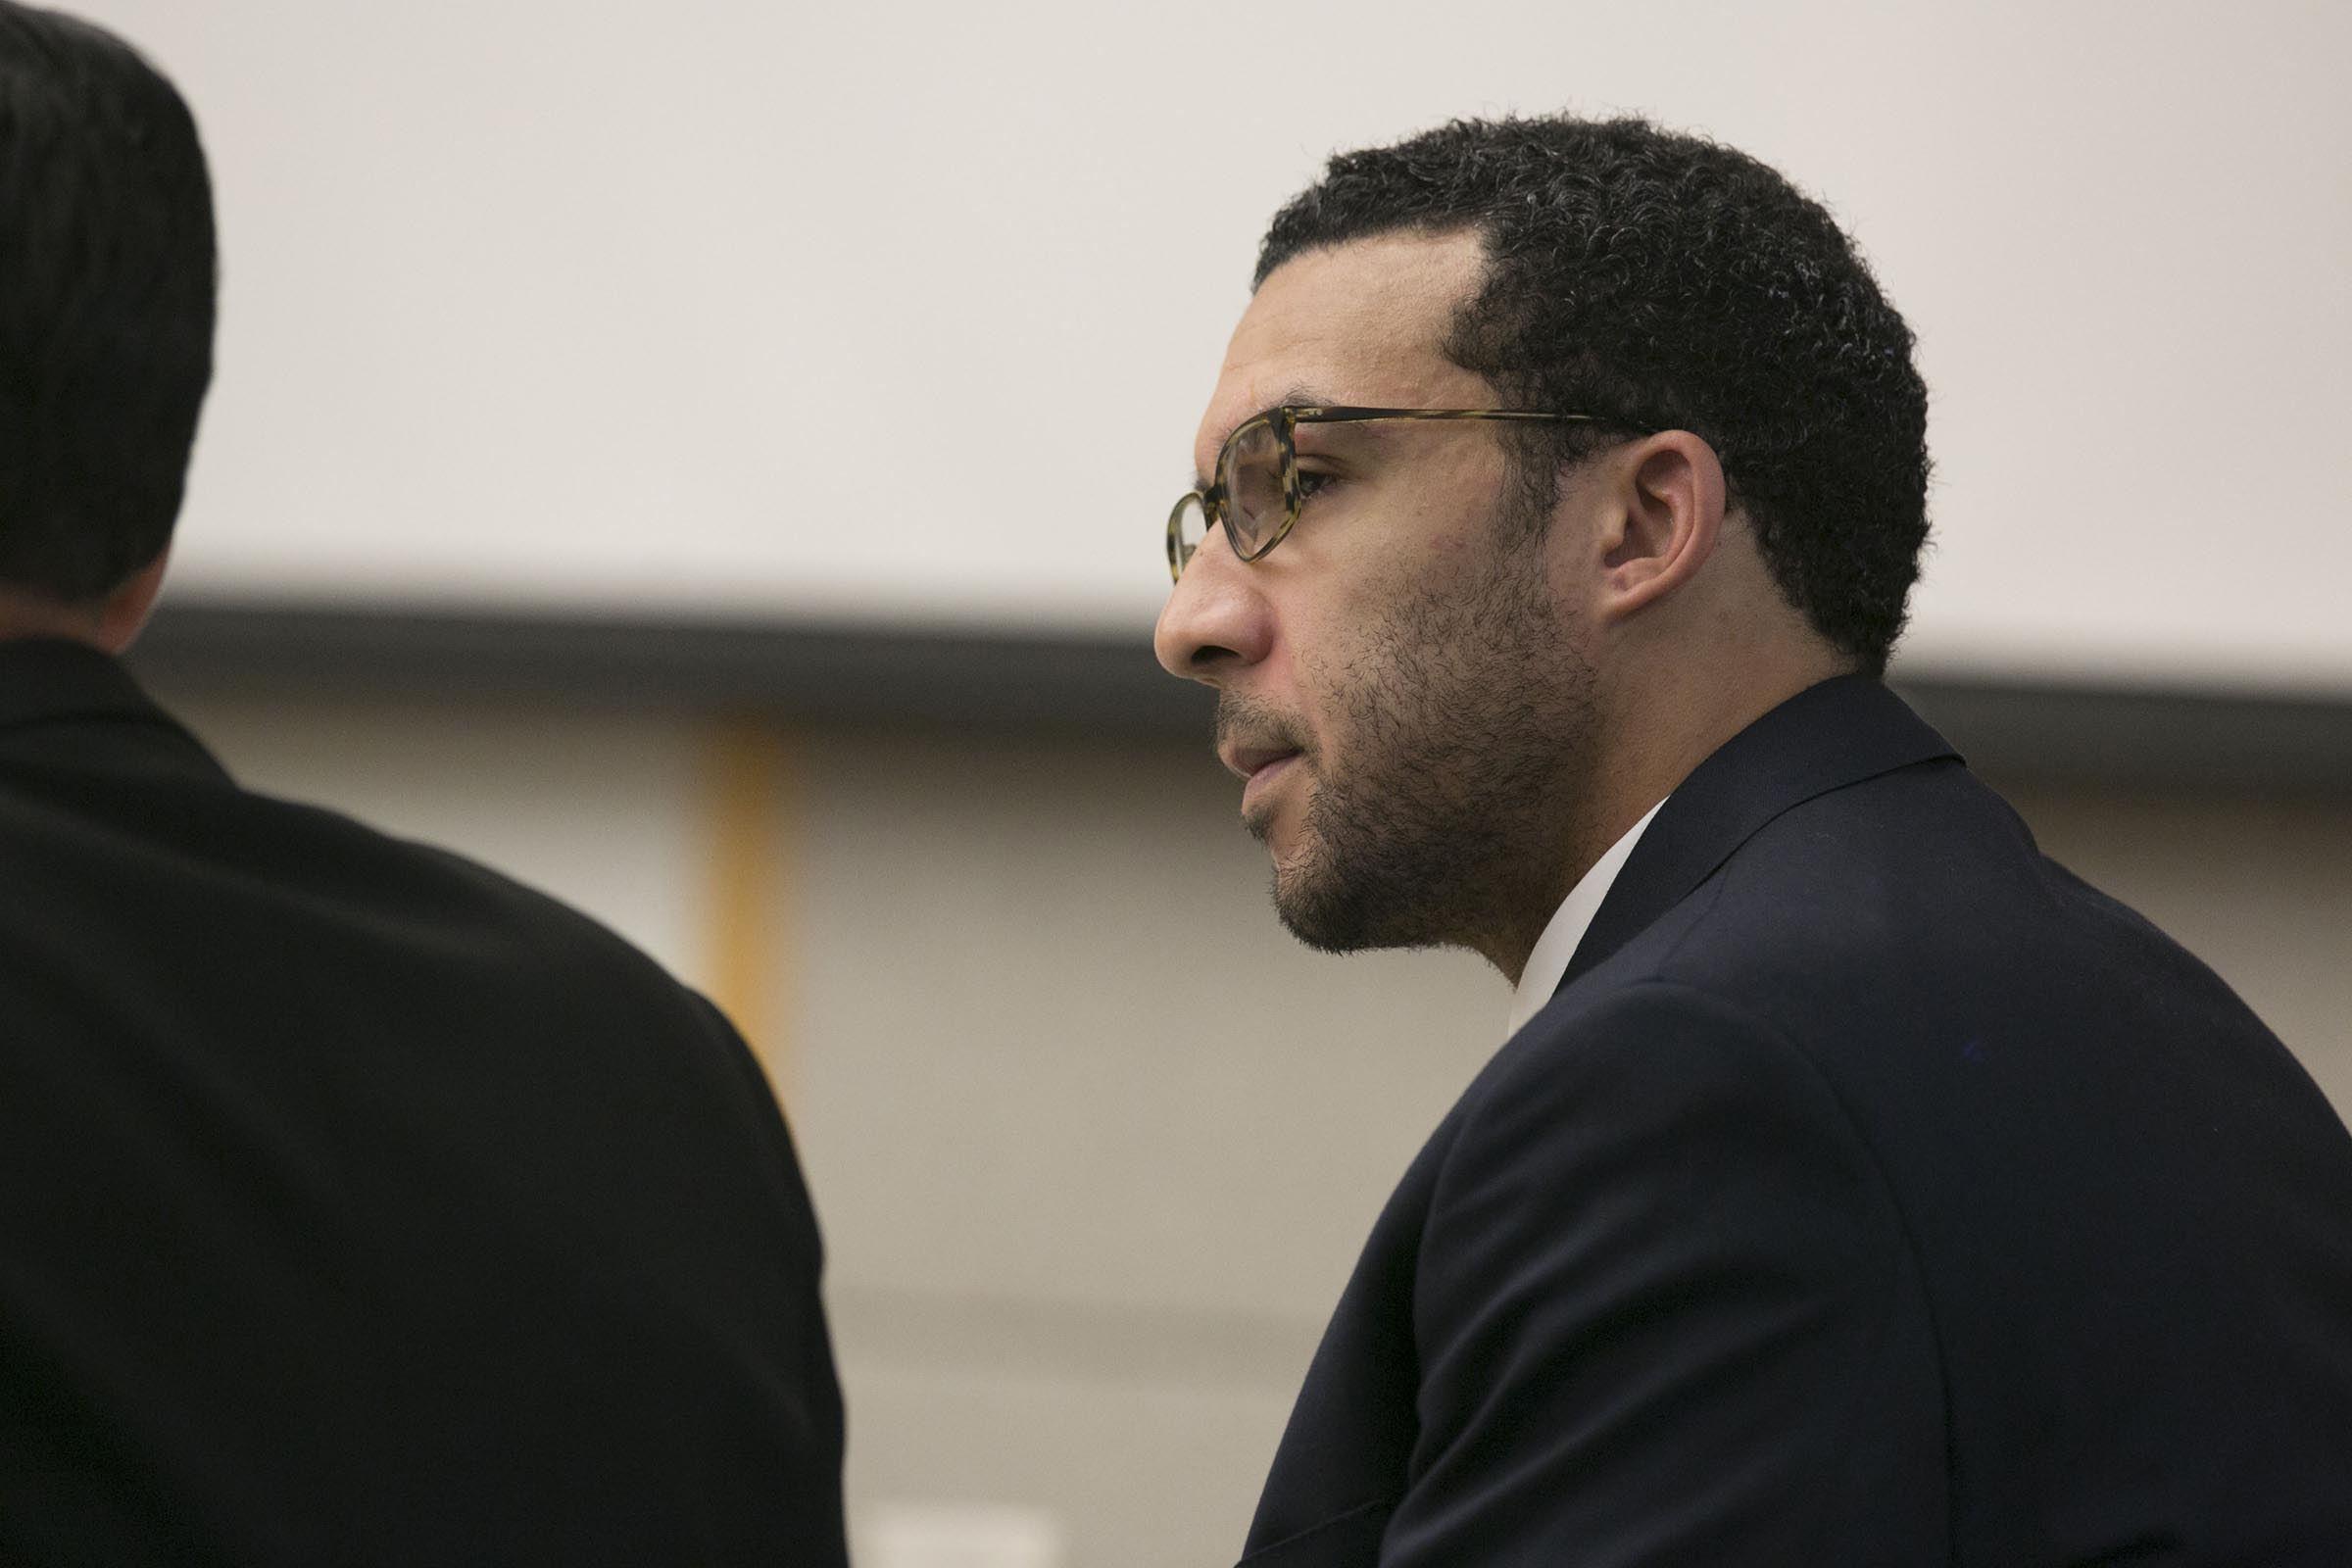 Trial Begins for Former NFL Star Accused of Being Serial Rapist